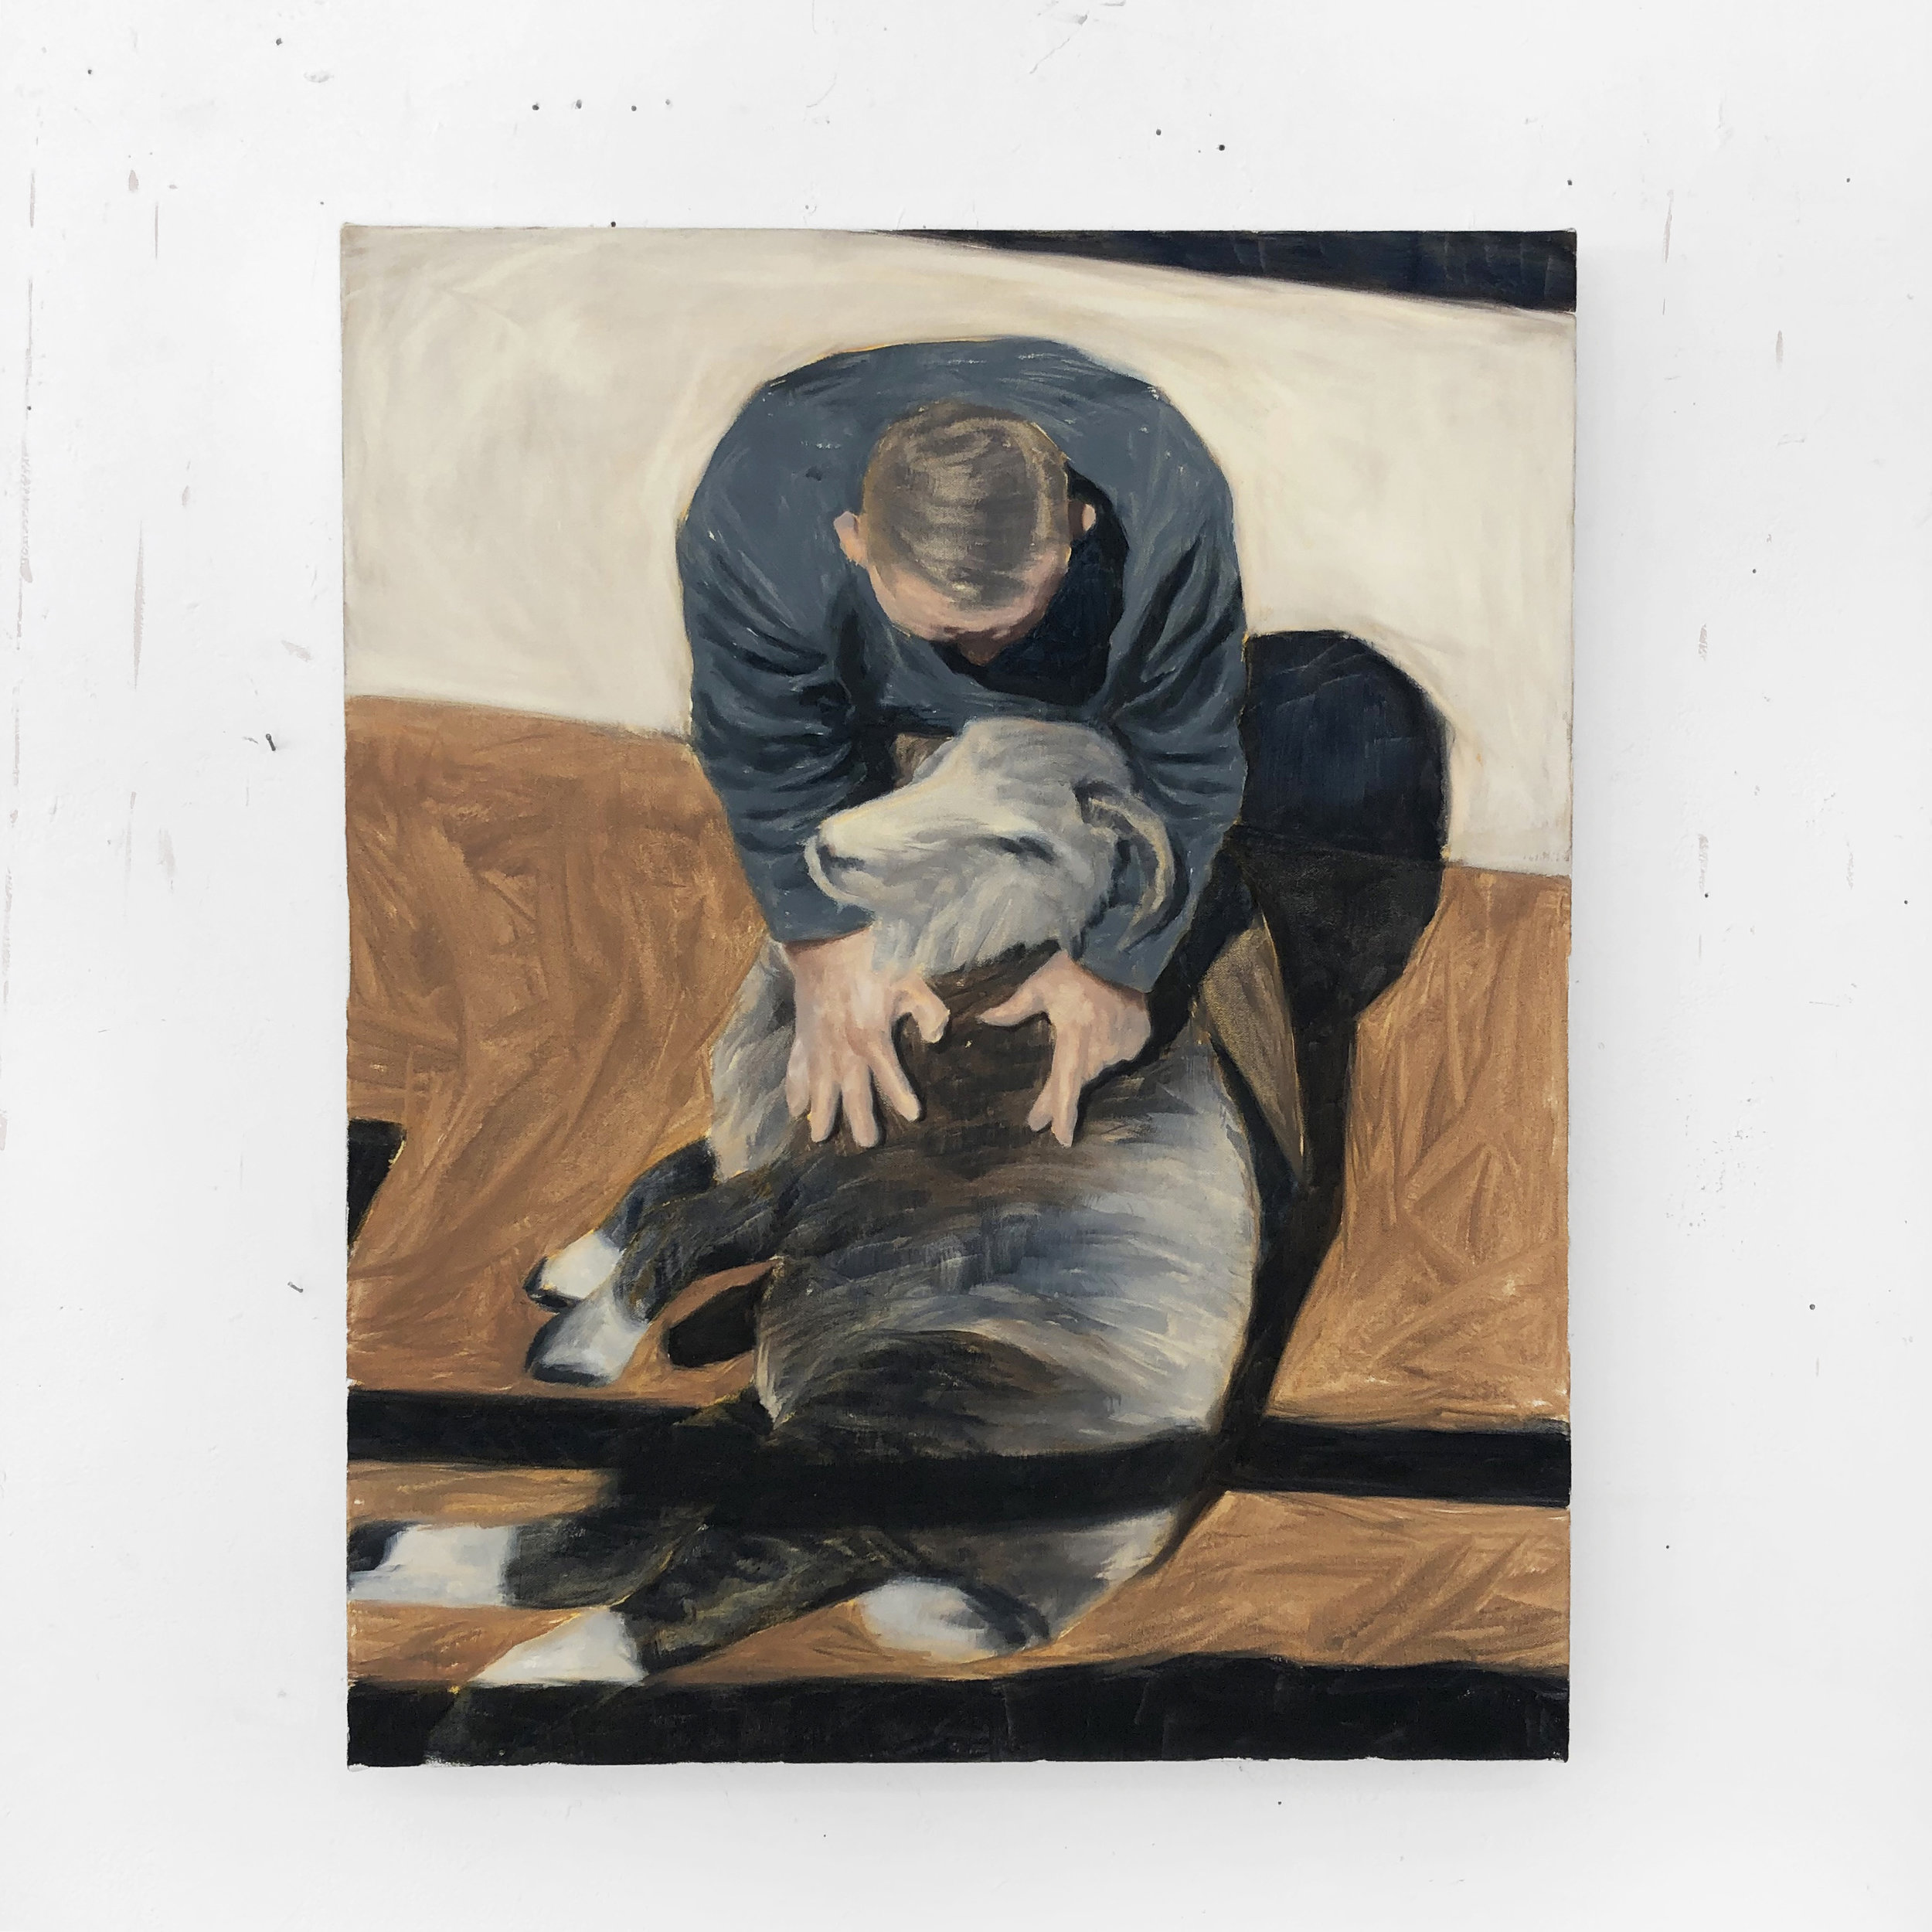 Ram,  oil on canvas, 2019